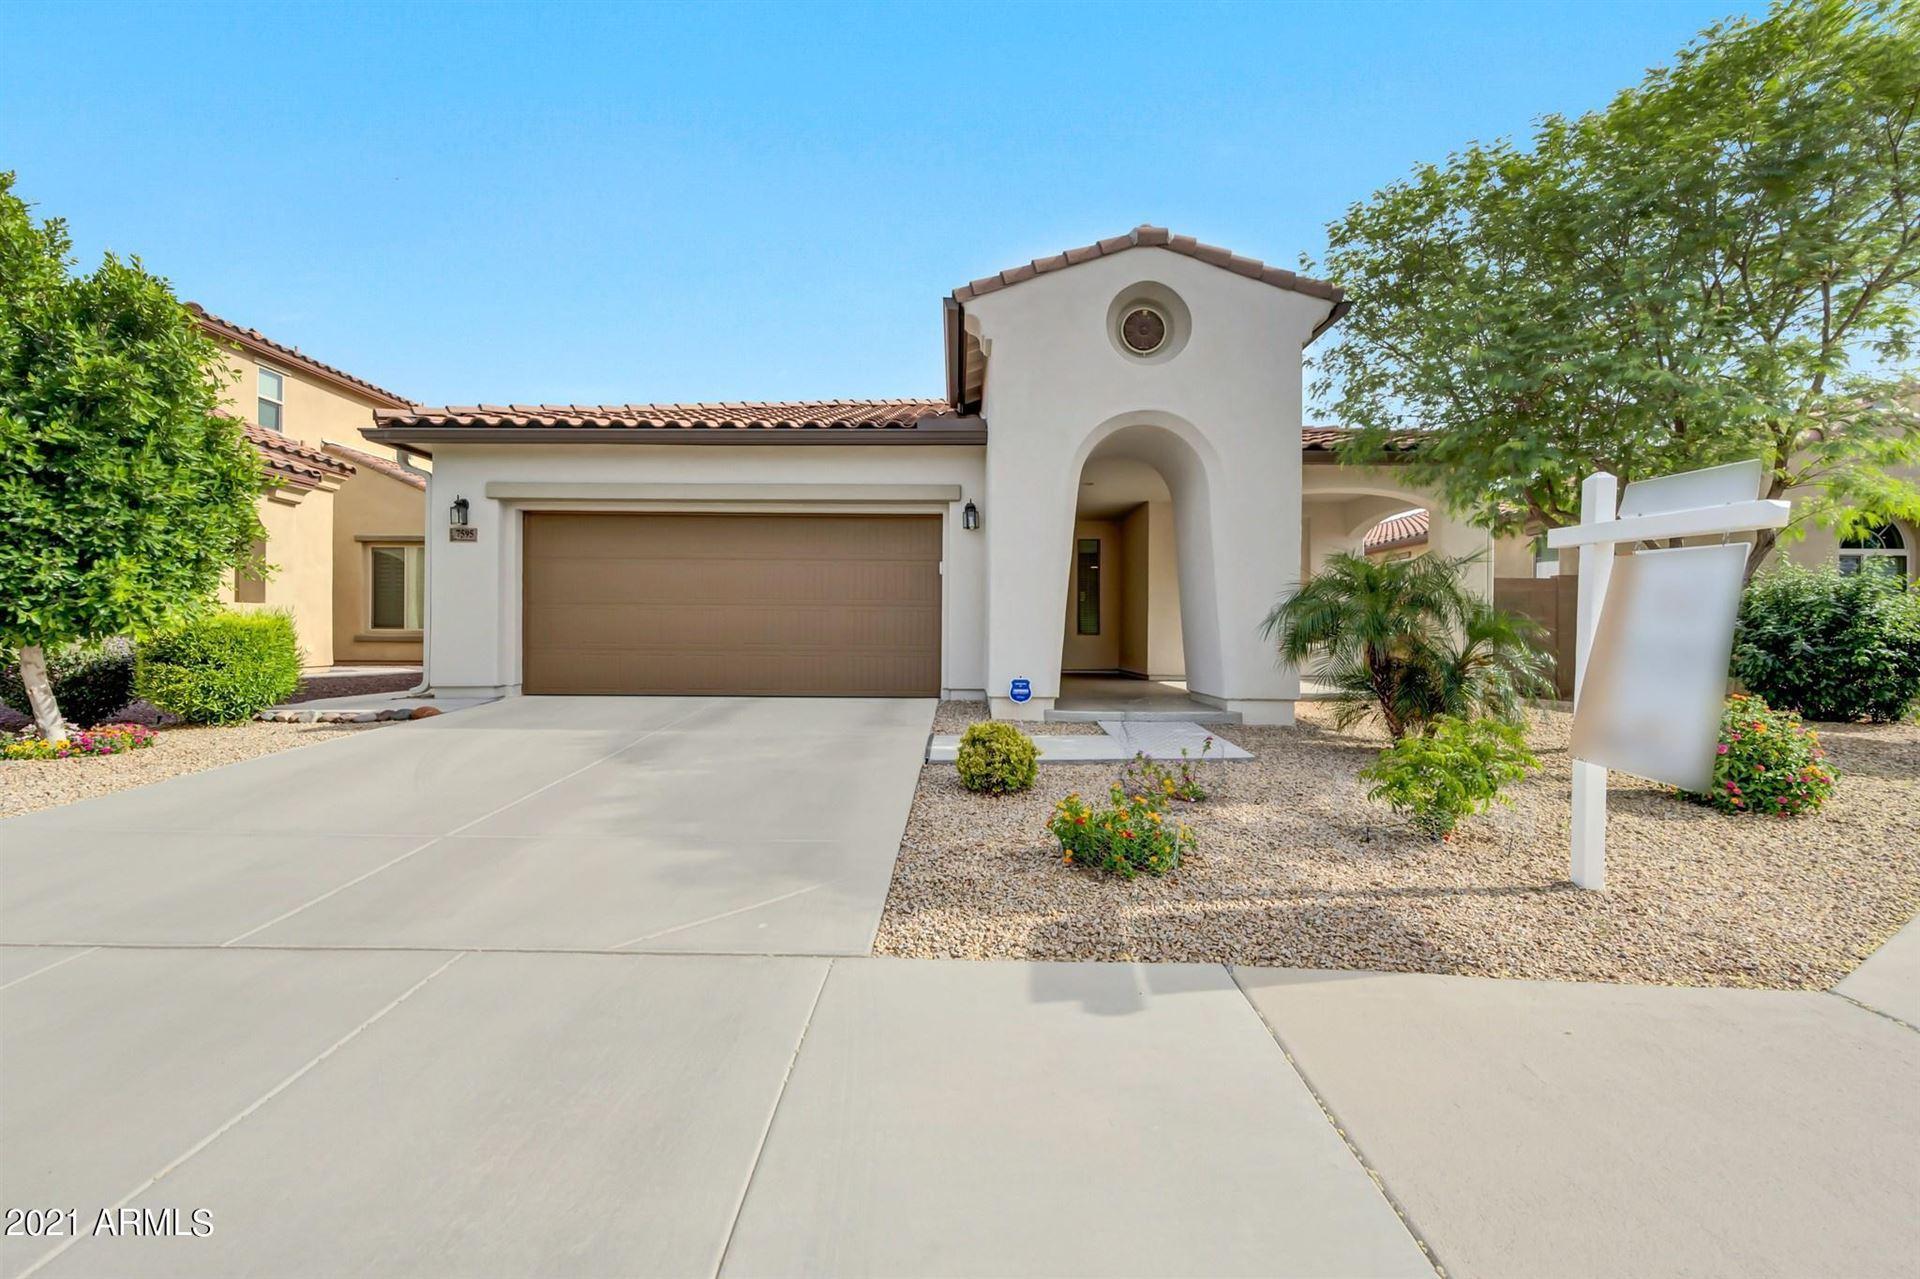 7595 W MOLLY Drive, Peoria, AZ 85383 - #: 6229784